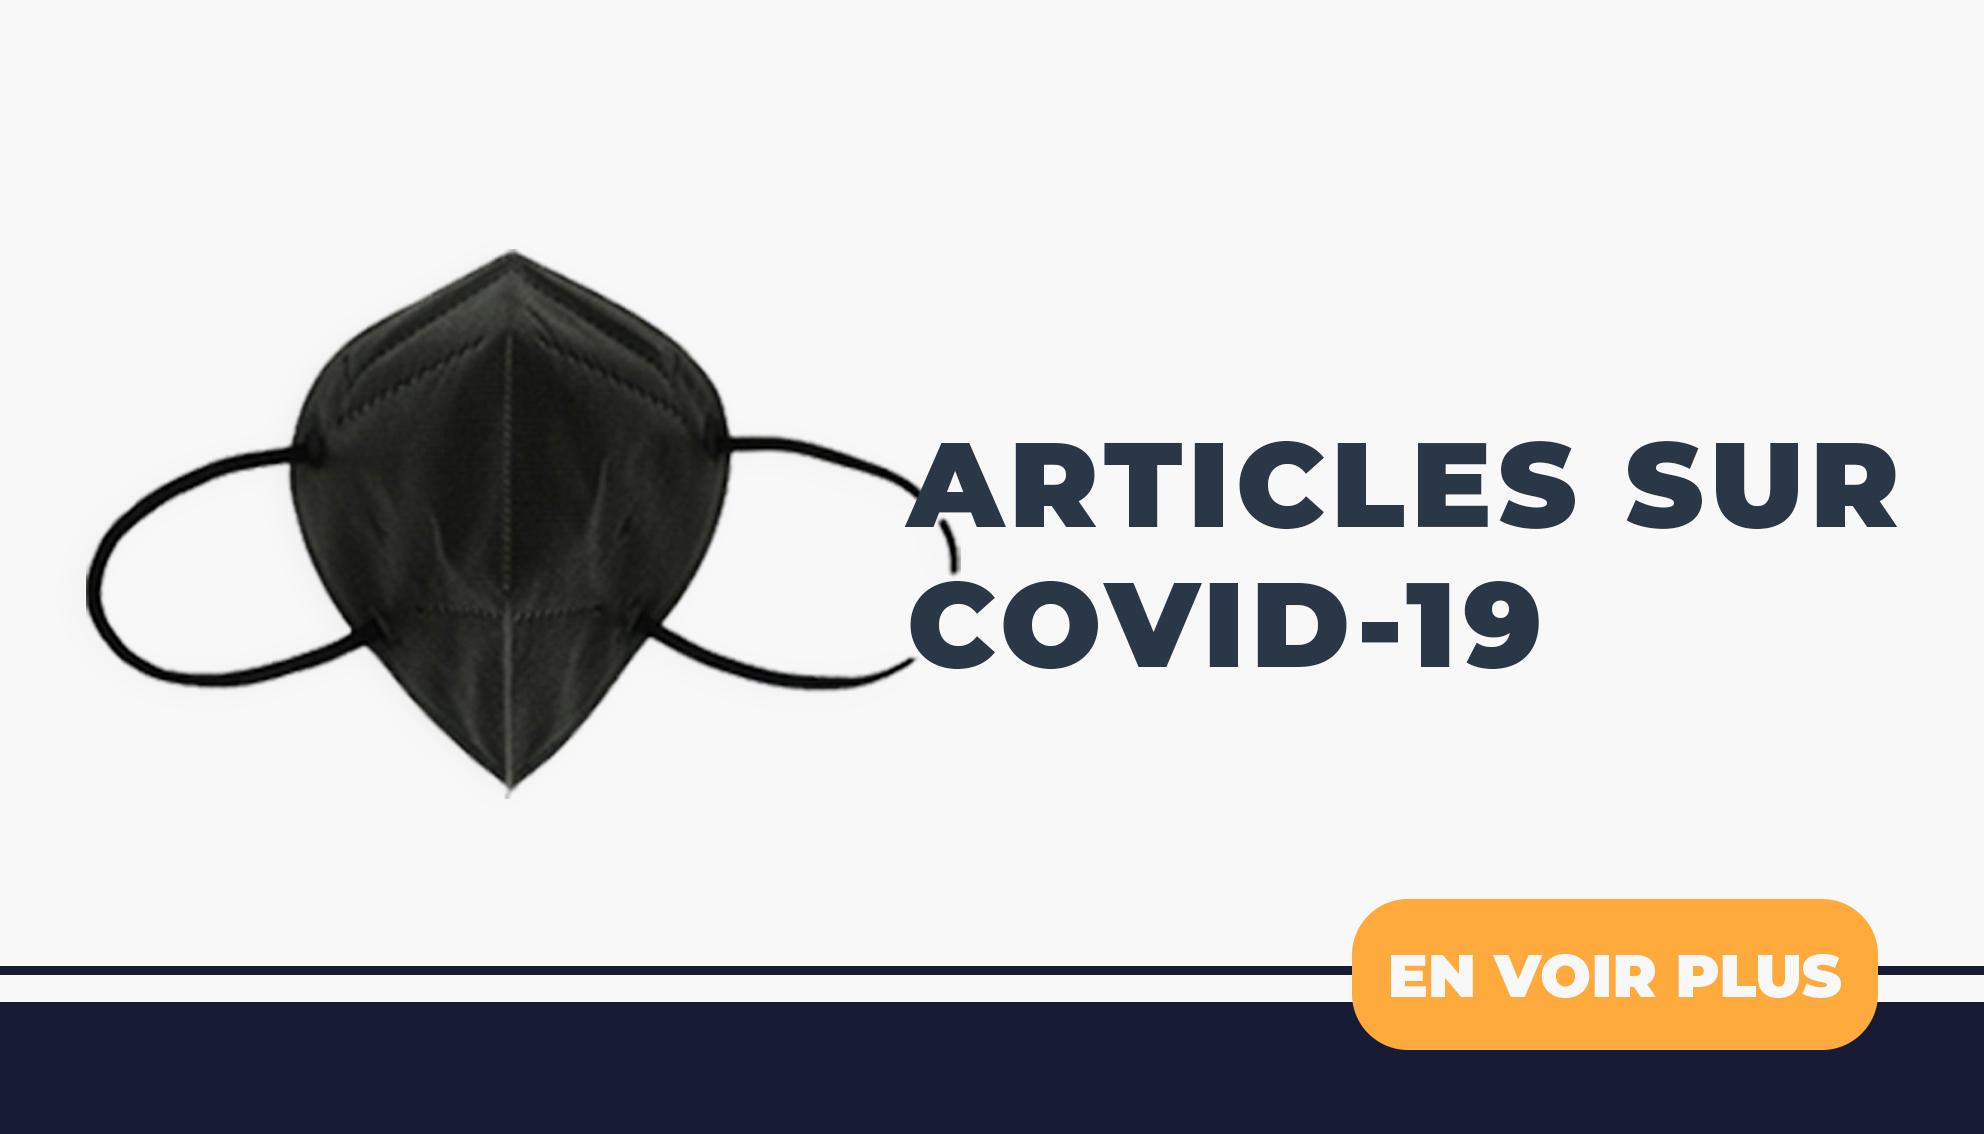 articles sur covid19.jpg